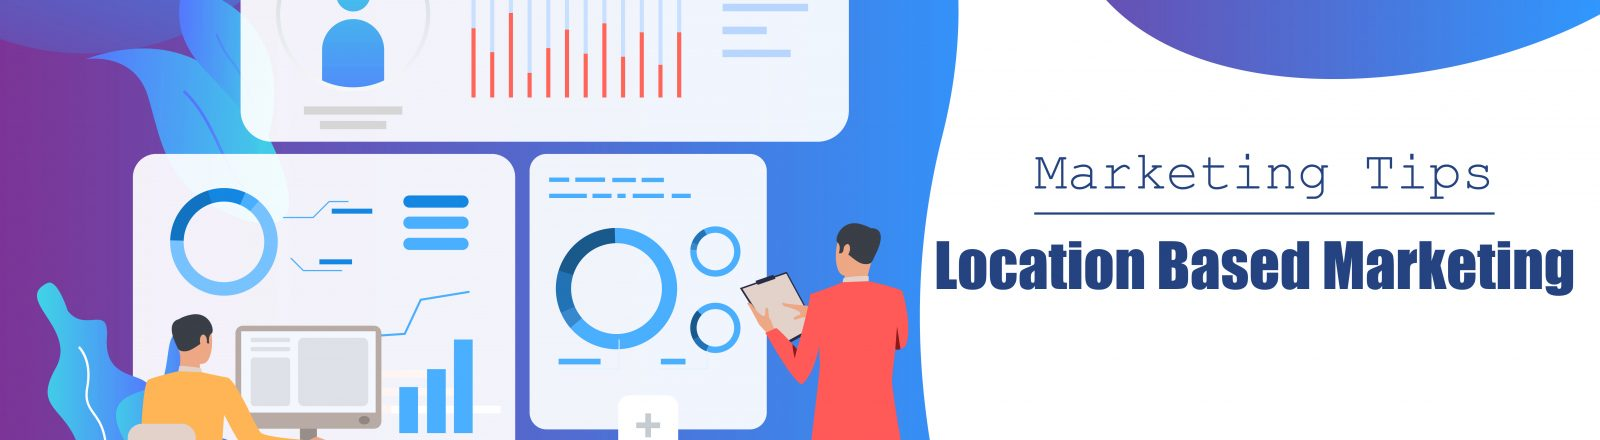 Location Based Marketing LBM